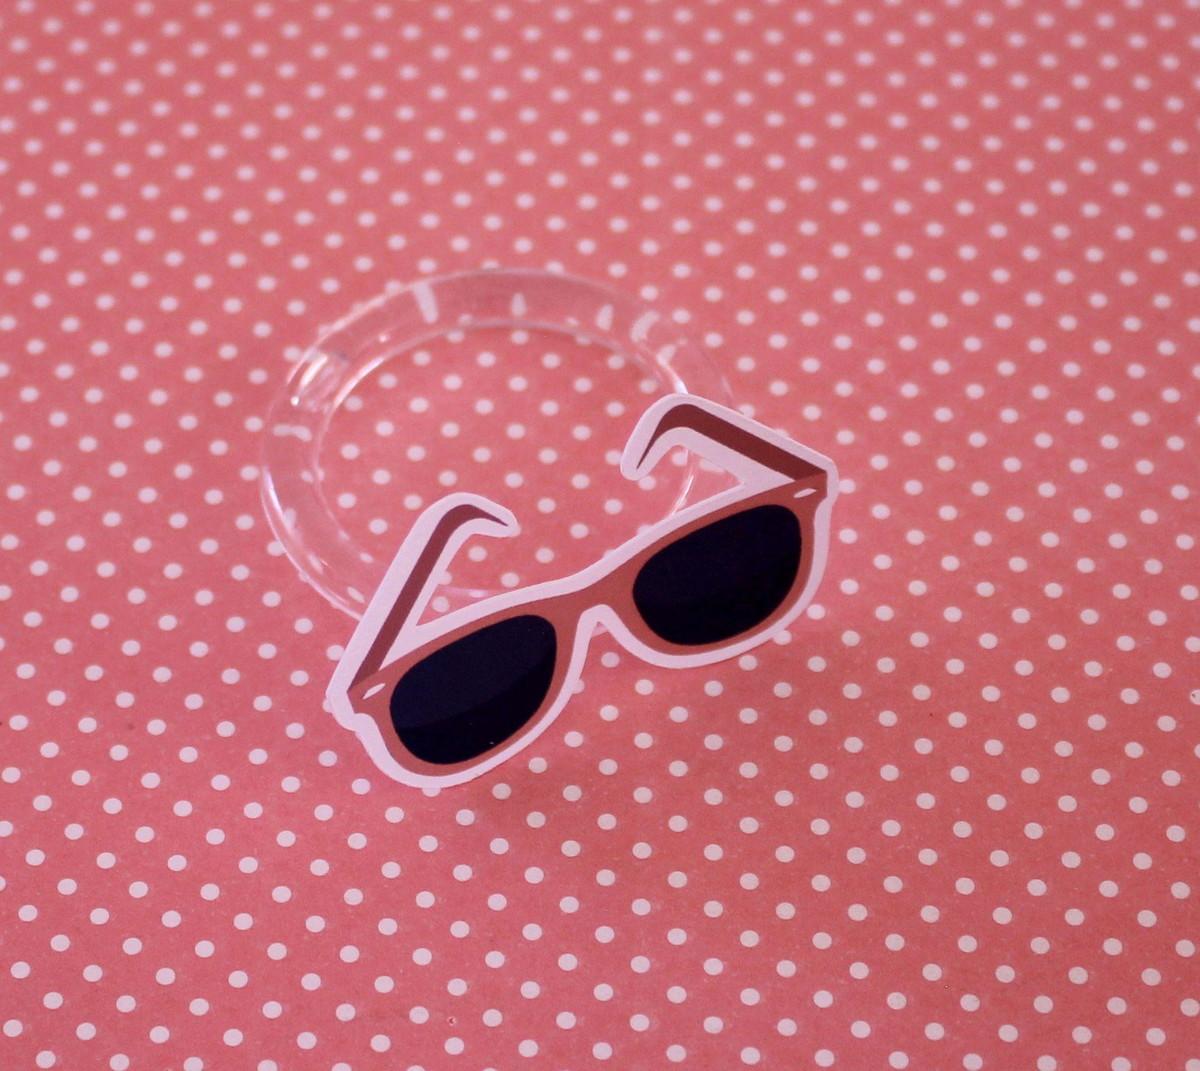 be3fd75ea5bb7 Porta-guardanapo - moda - óculos de sol no Elo7   A Carol que fez ...